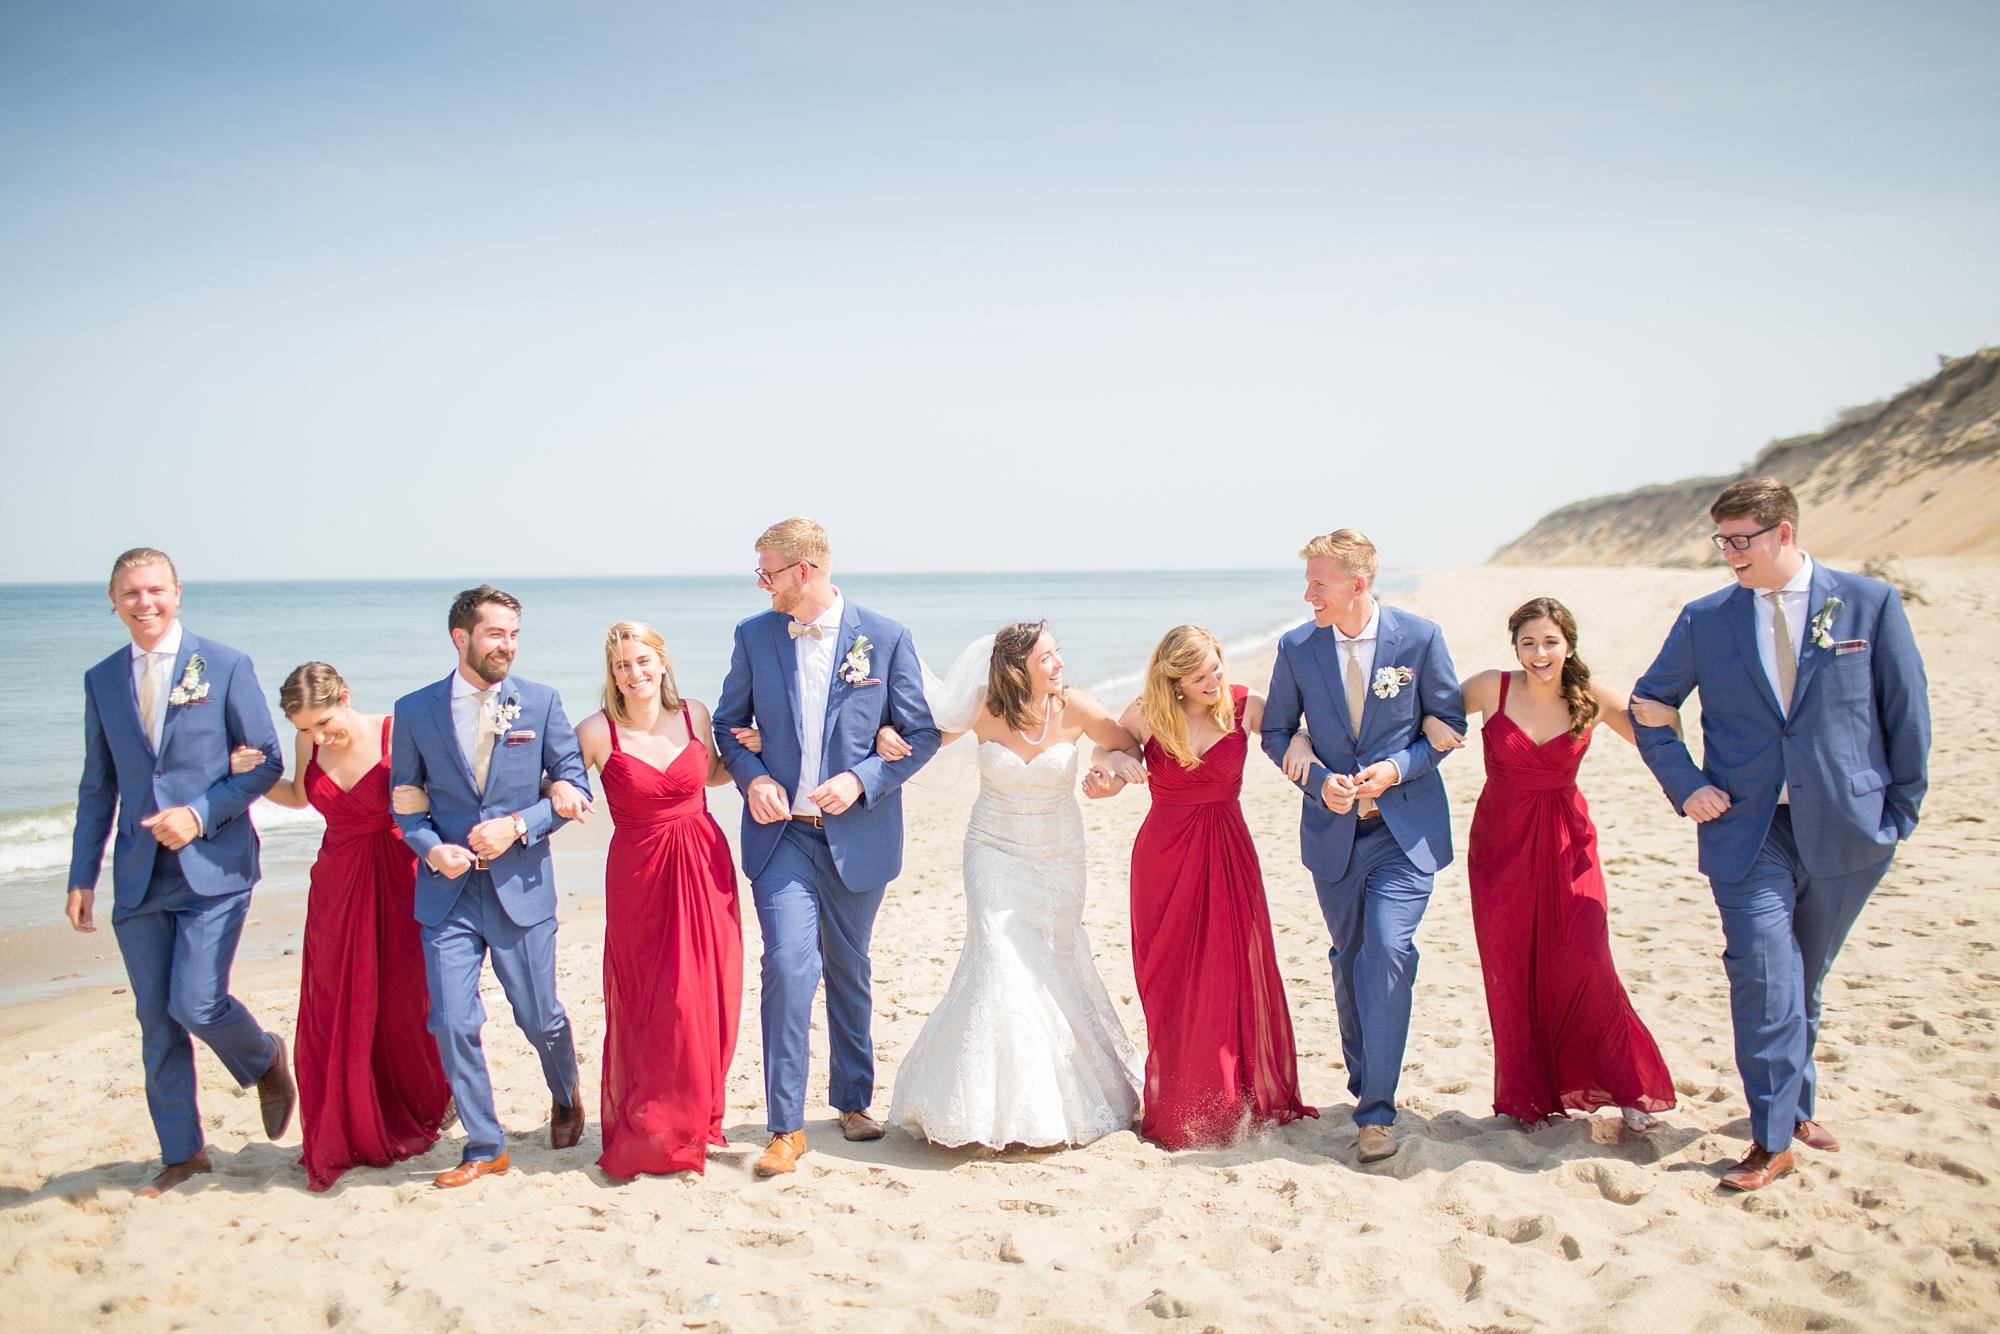 Goodman 4-Bridal Party-414_anna grace photography wellfleet cape cod massachusetts destination wedding photographer Chequessett Yacht and Country Club wedding photo.jpg